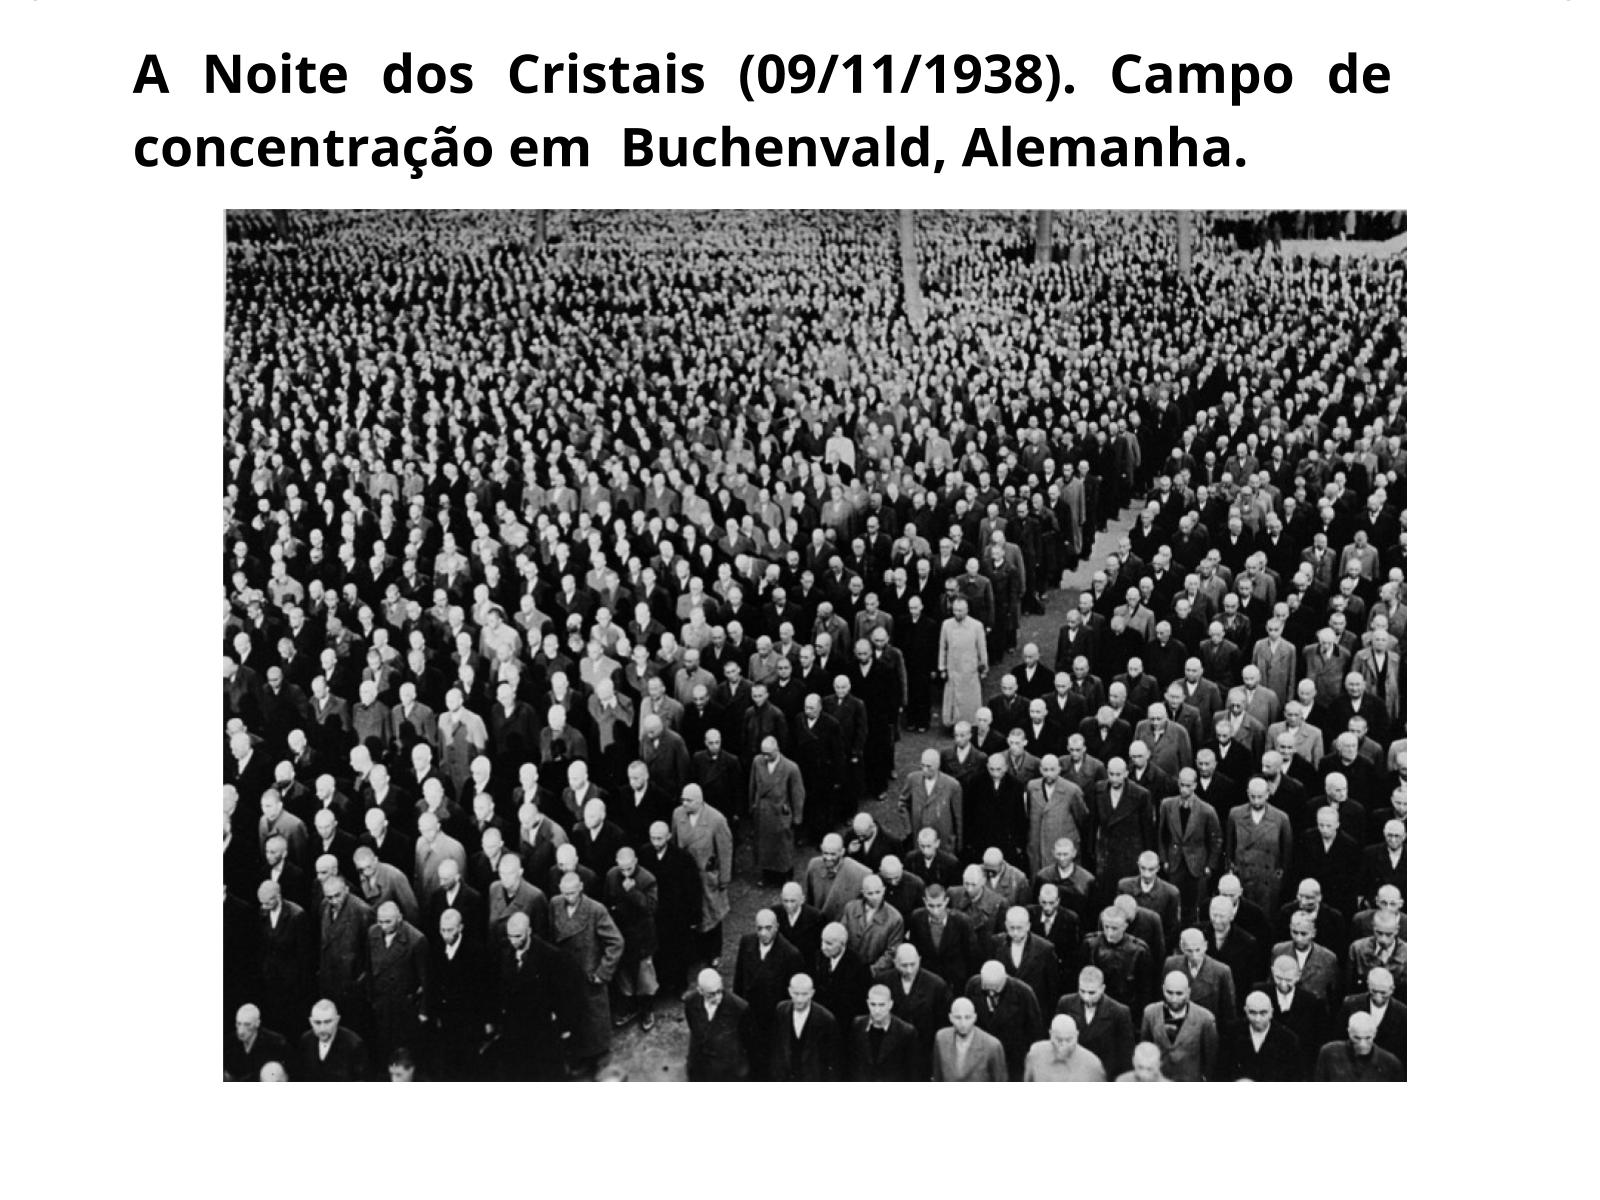 O nazismo e o Holocausto